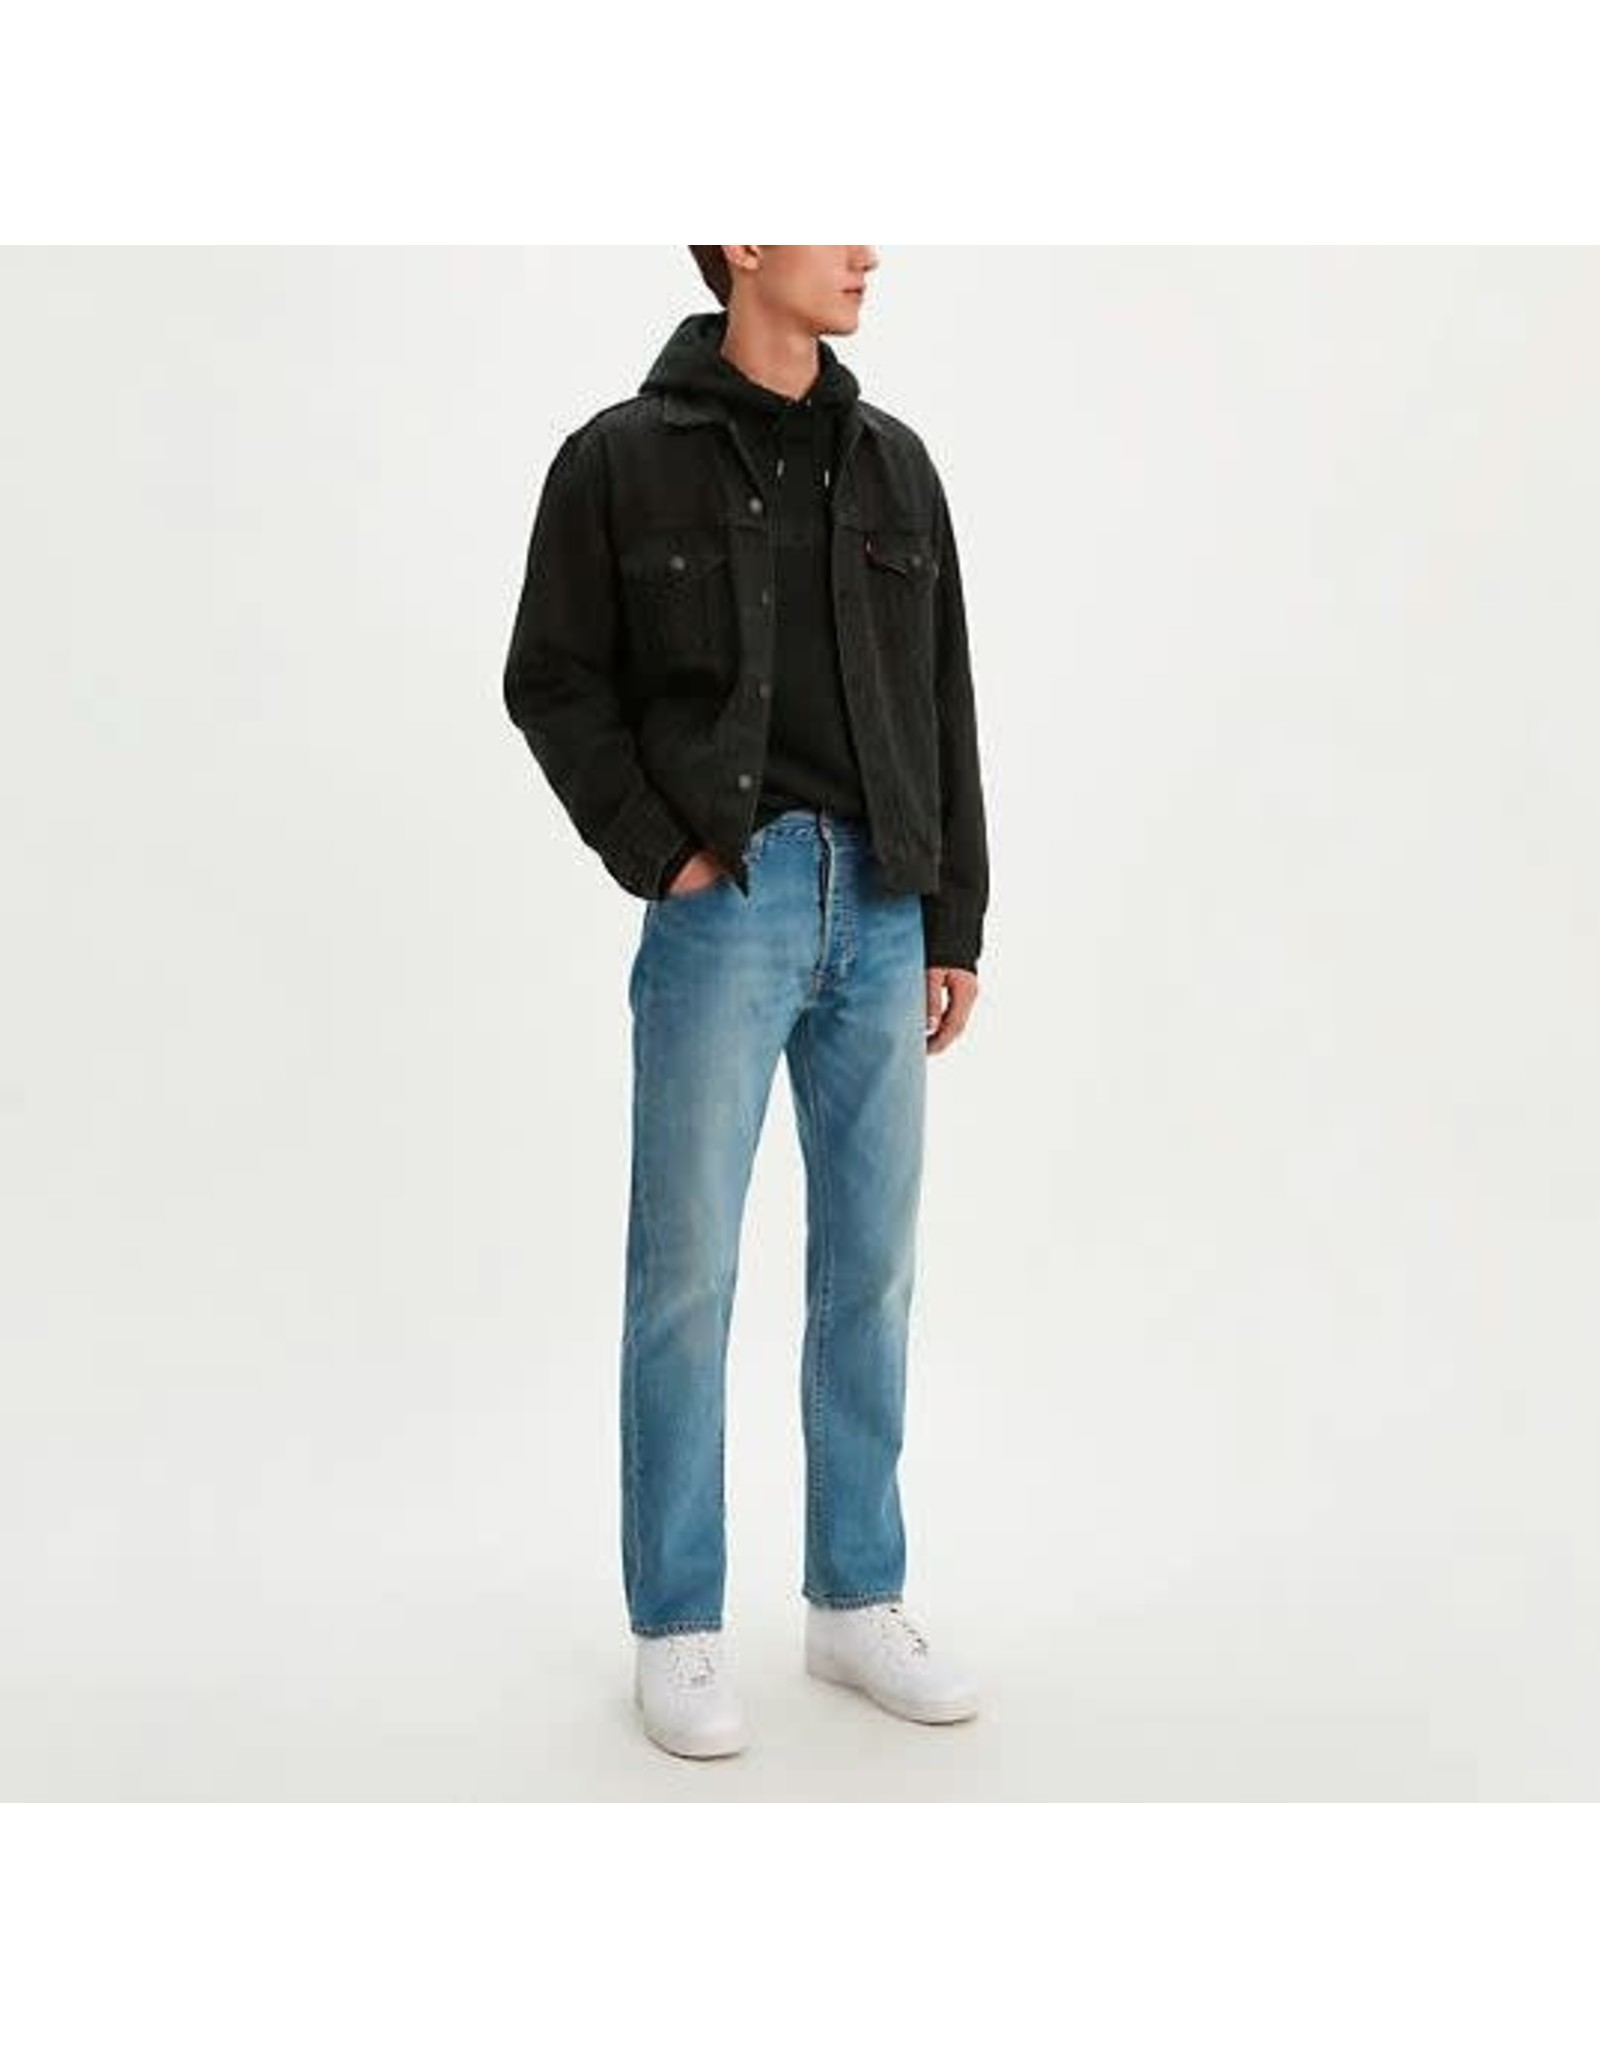 levi's Levi's - jeans 501  '93 straight leg